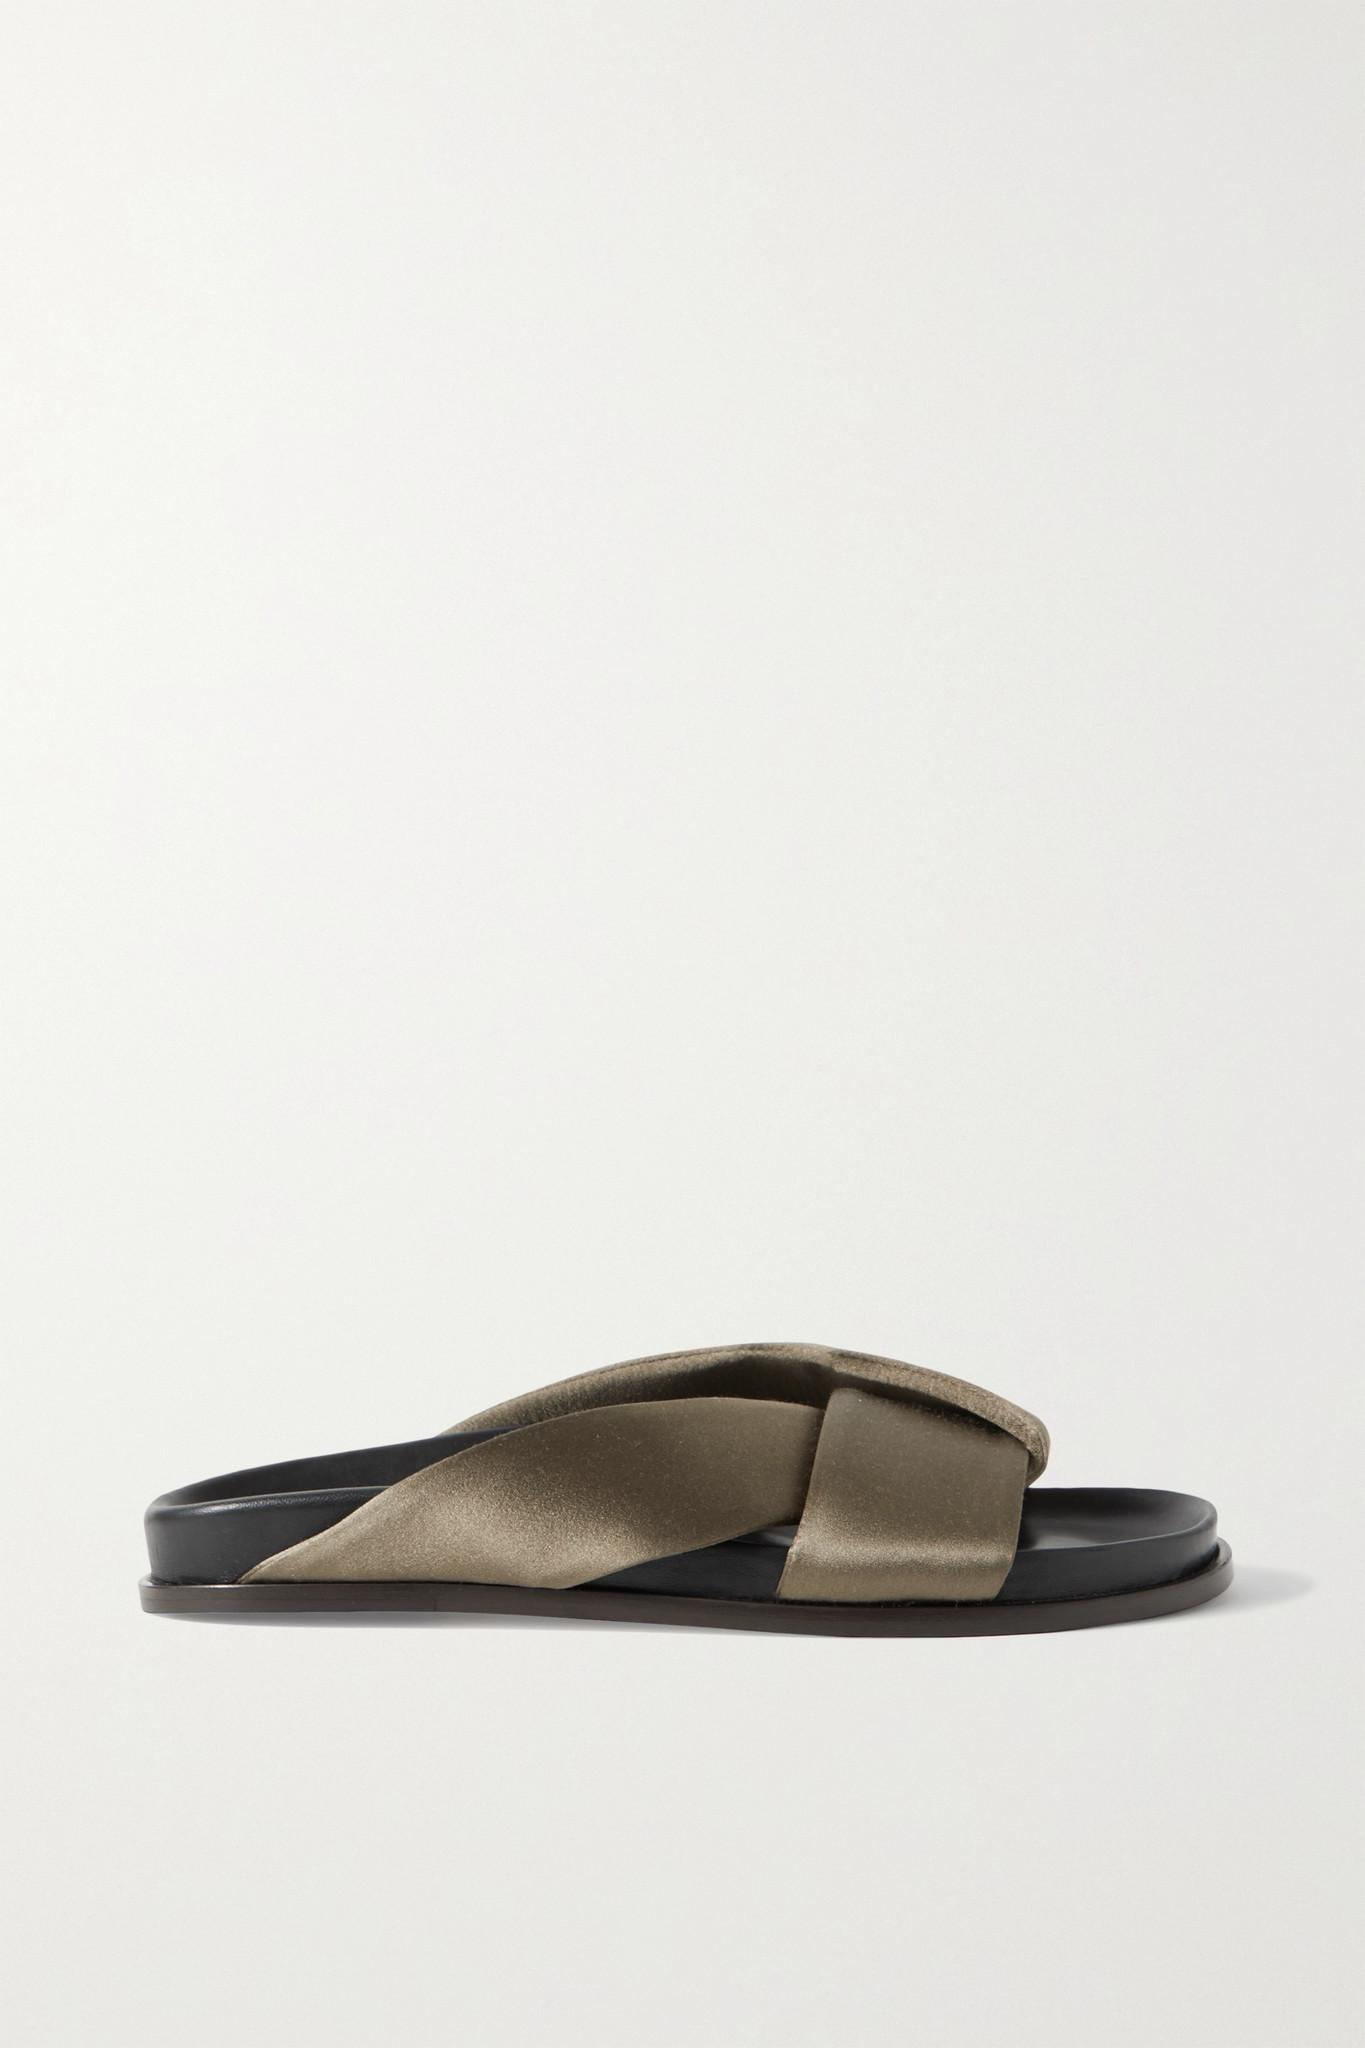 EMME PARSONS - 皮革拖鞋 - 绿色 - IT41